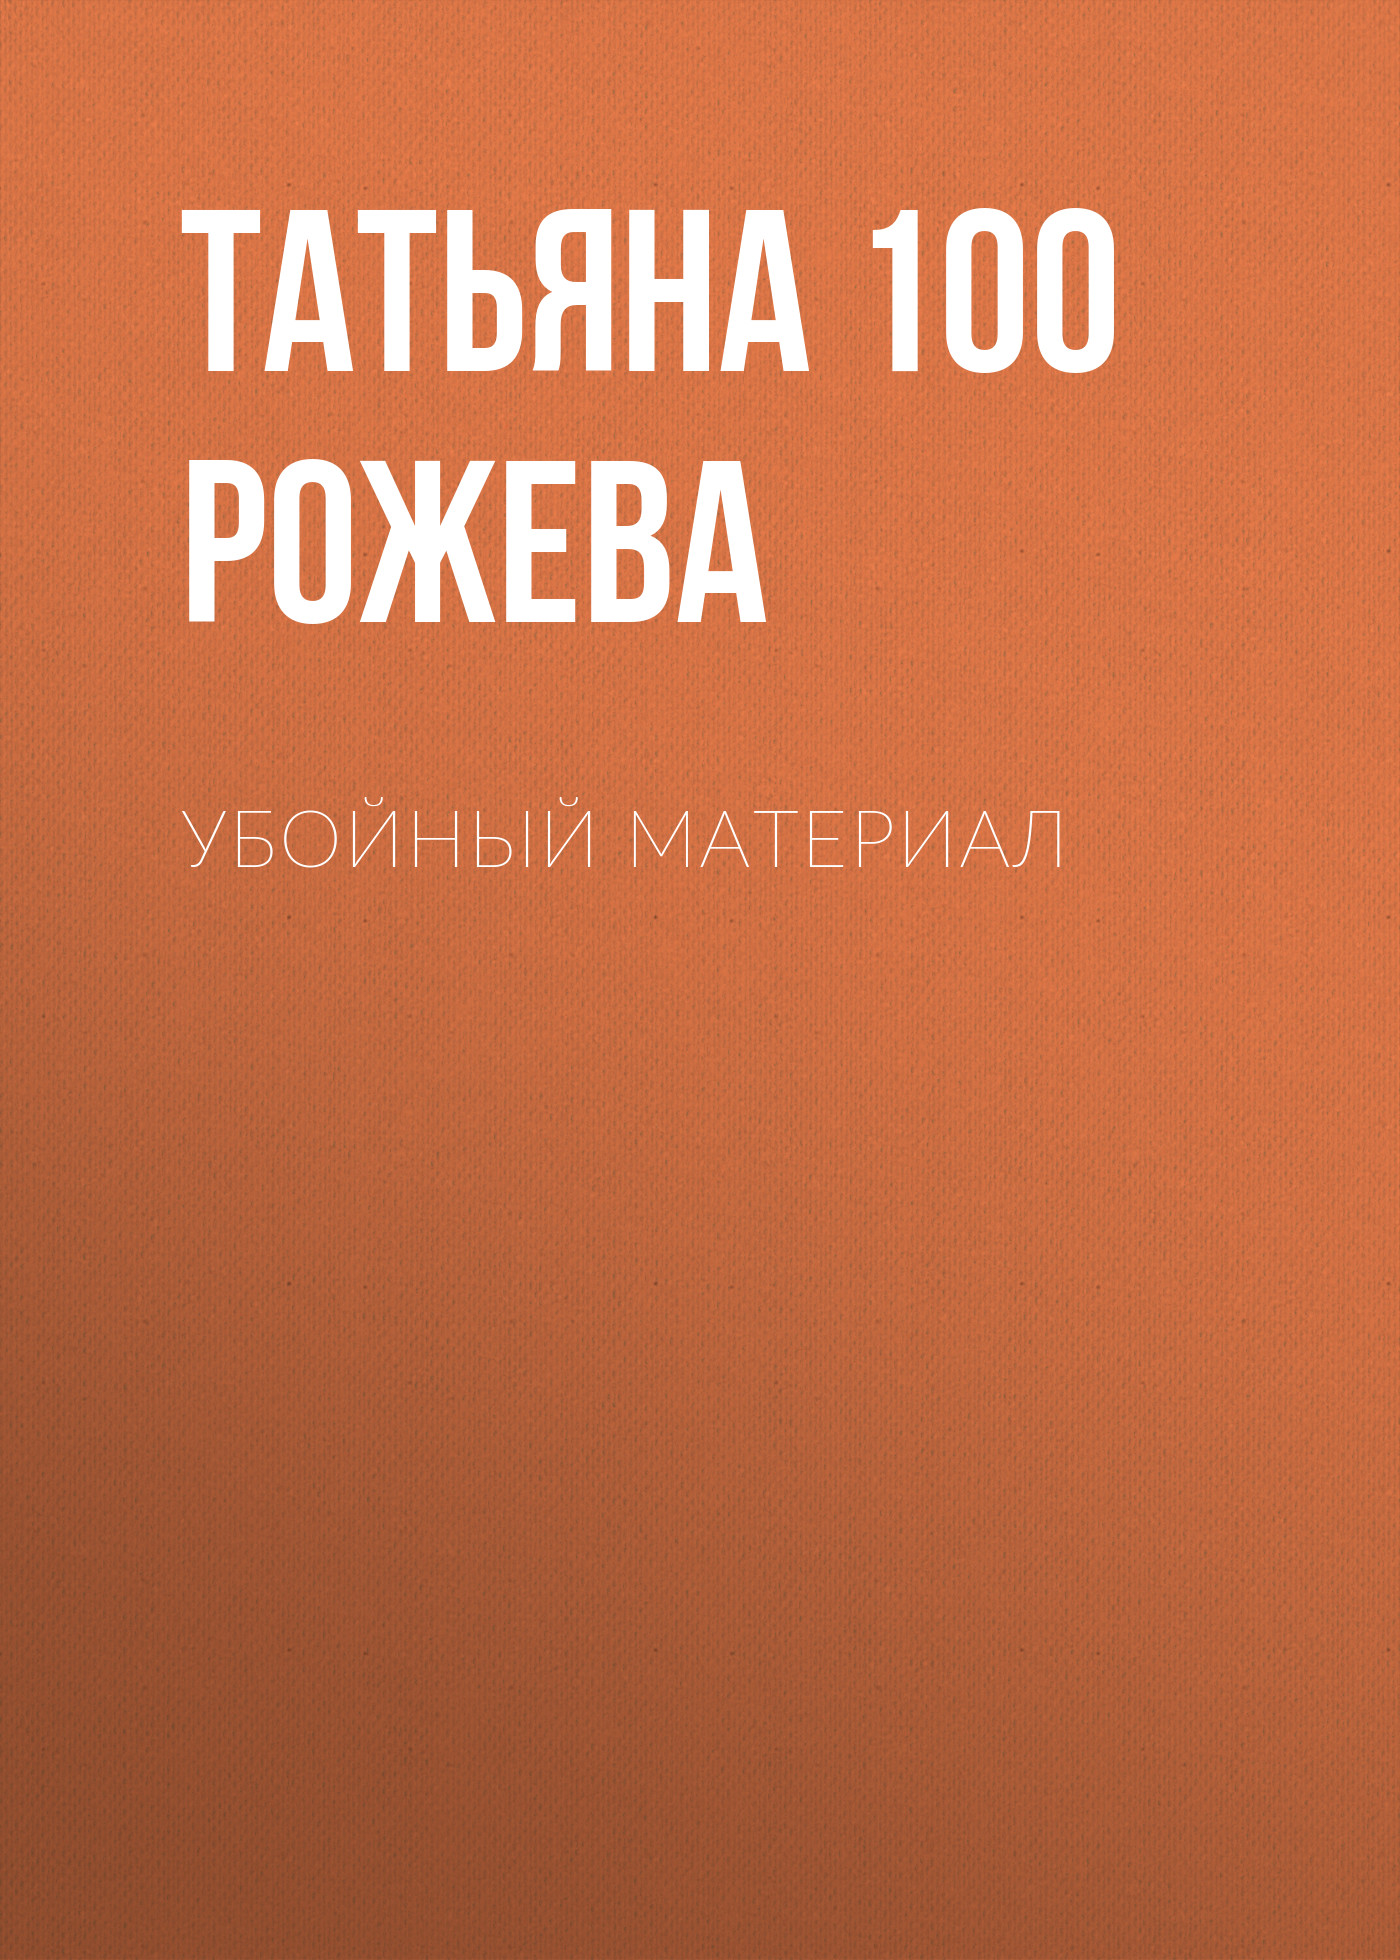 Татьяна 100 Рожева Убойный материал цена 2017